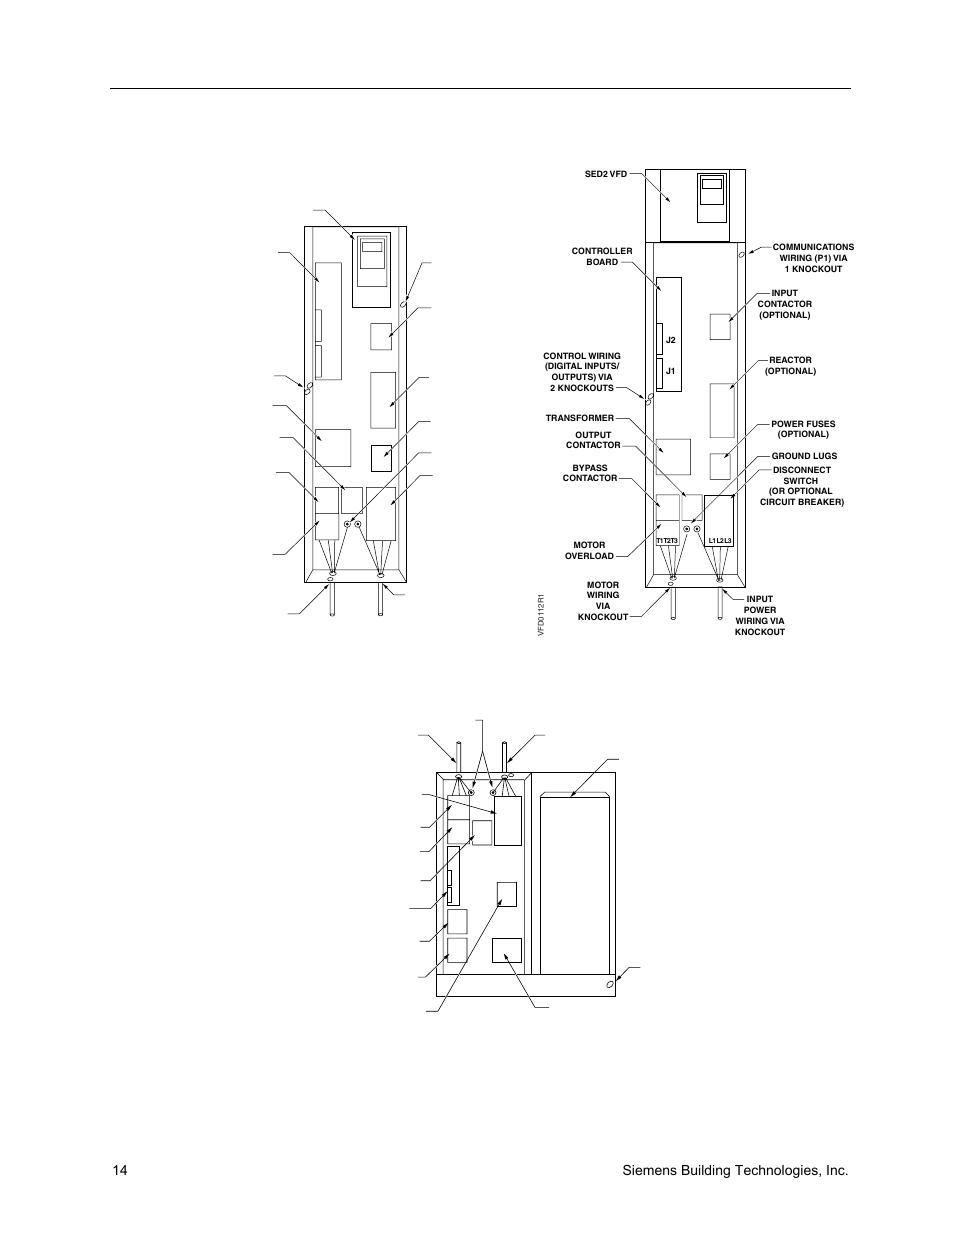 medium resolution of 14 siemens building technologies inc siemens sed2 vfd electronic wiring diagram for sed2 14 siemens